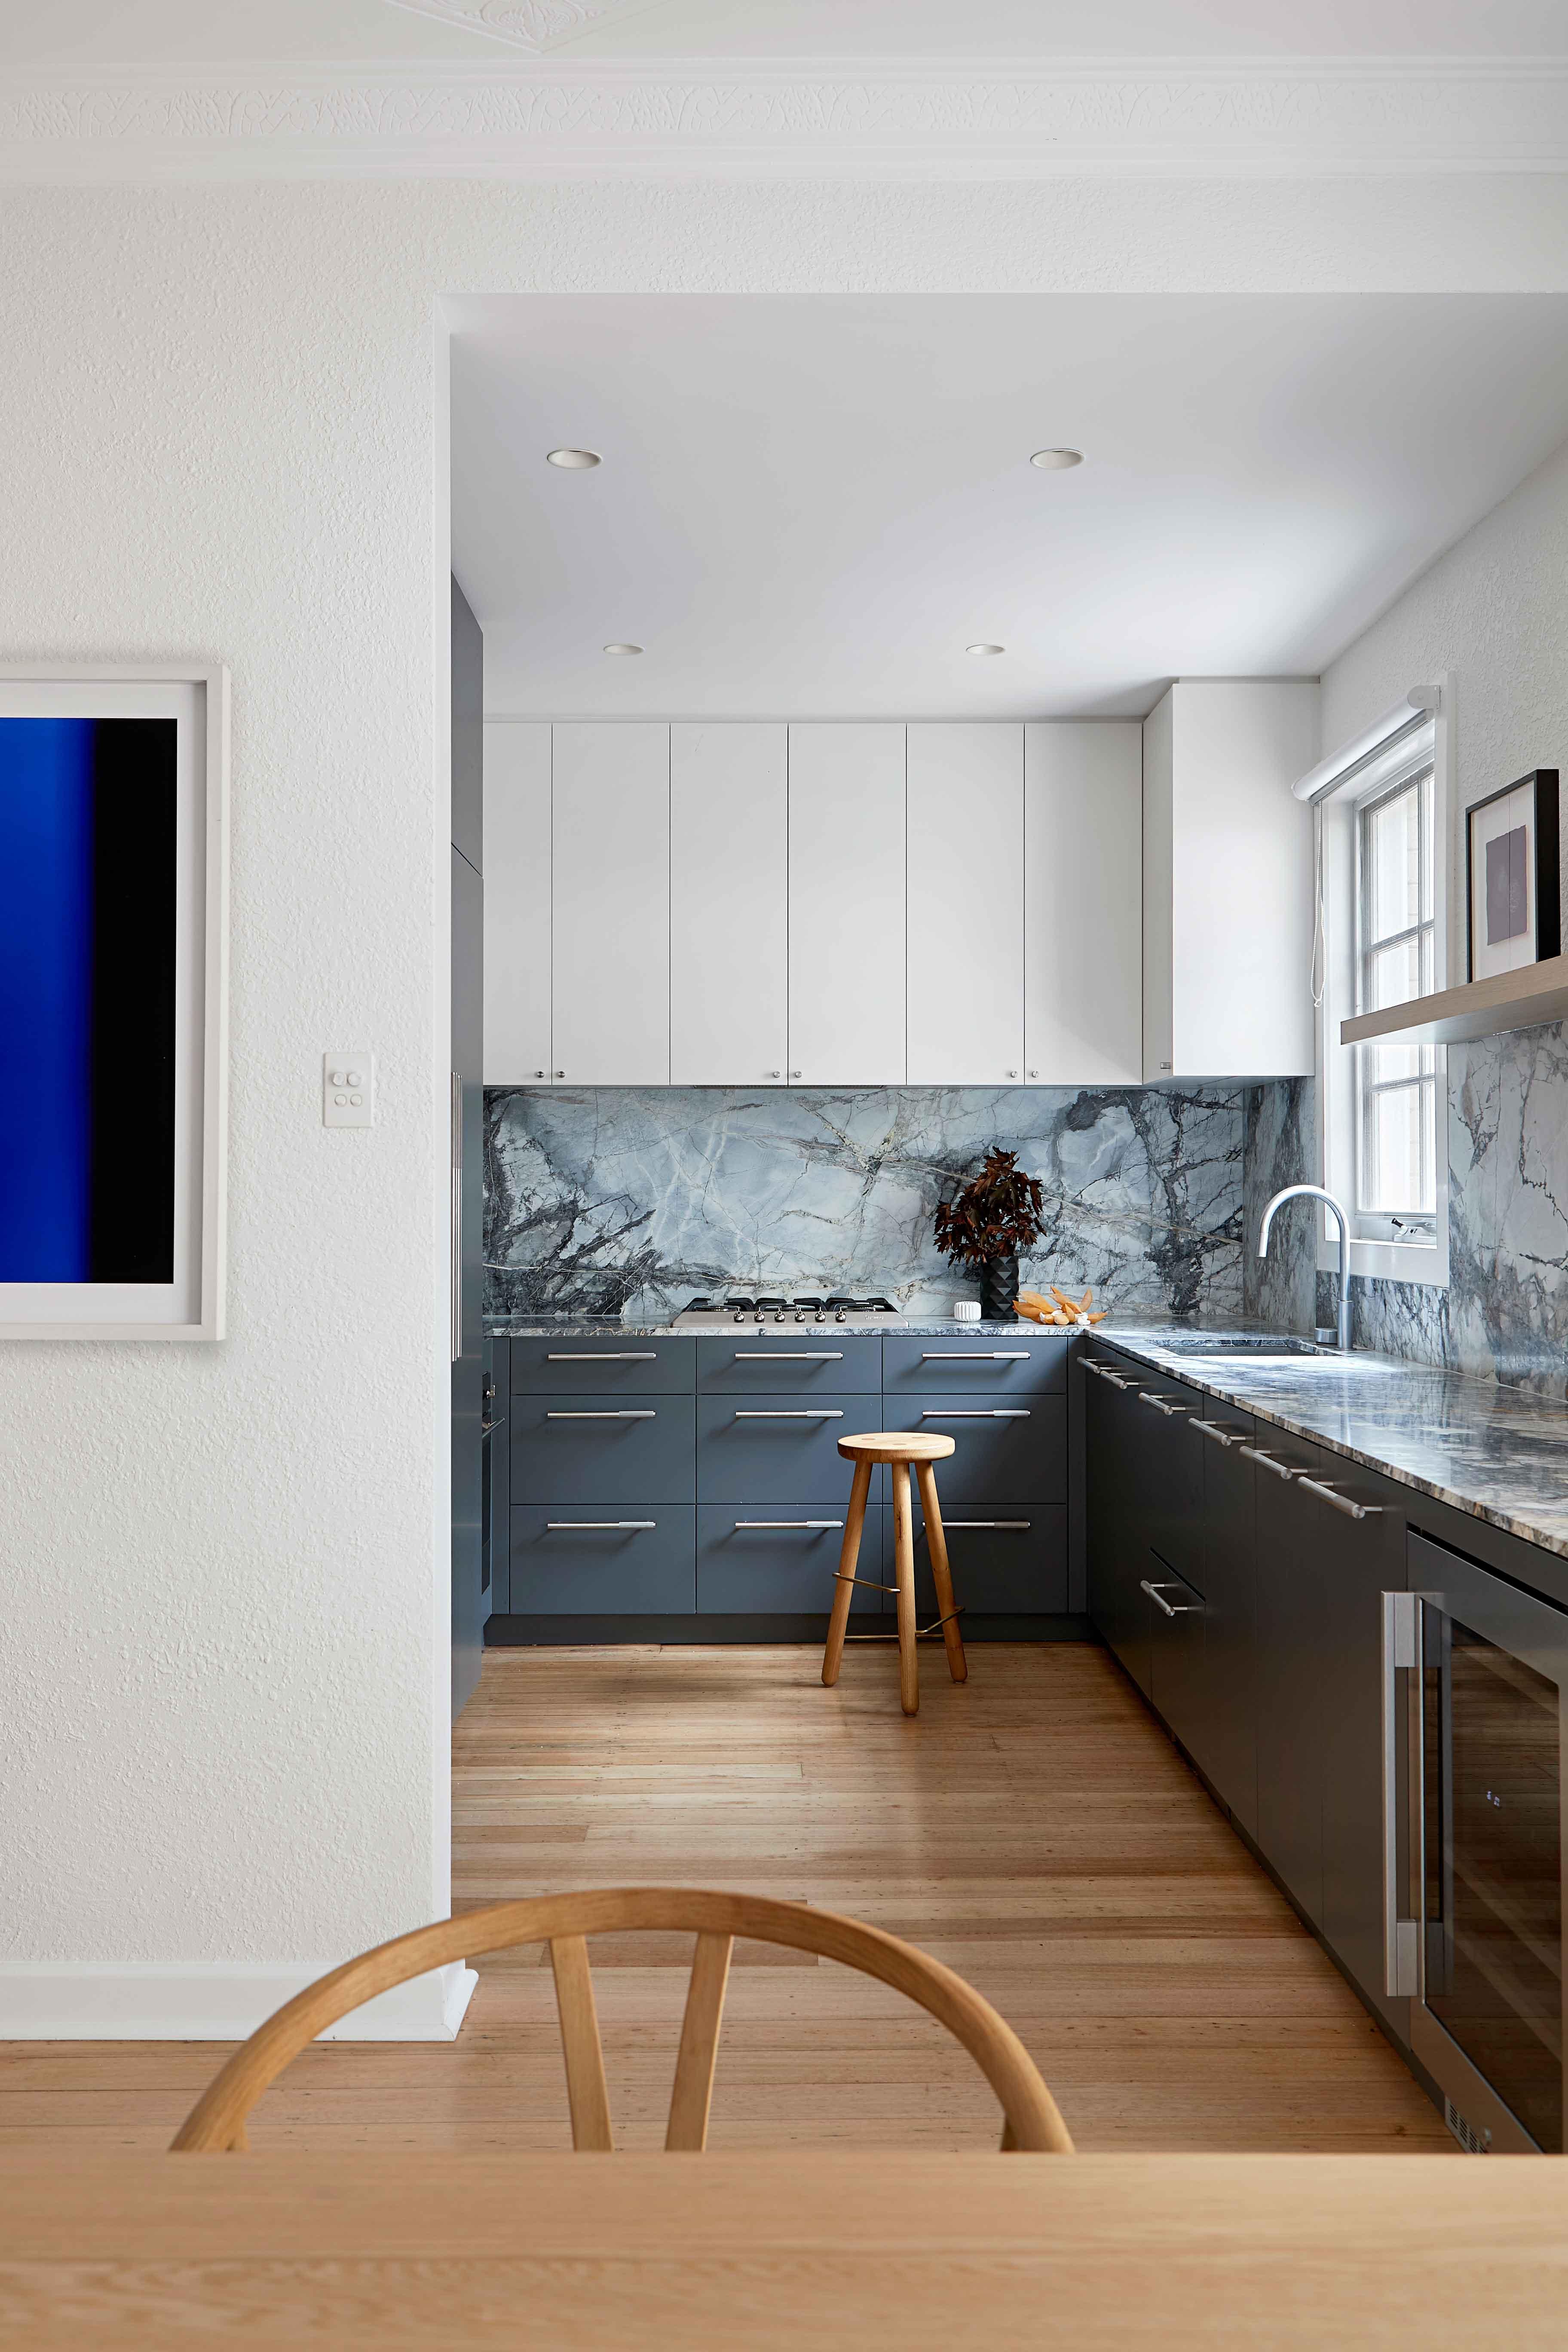 Photo of kitchen interior design by Anthology design practice